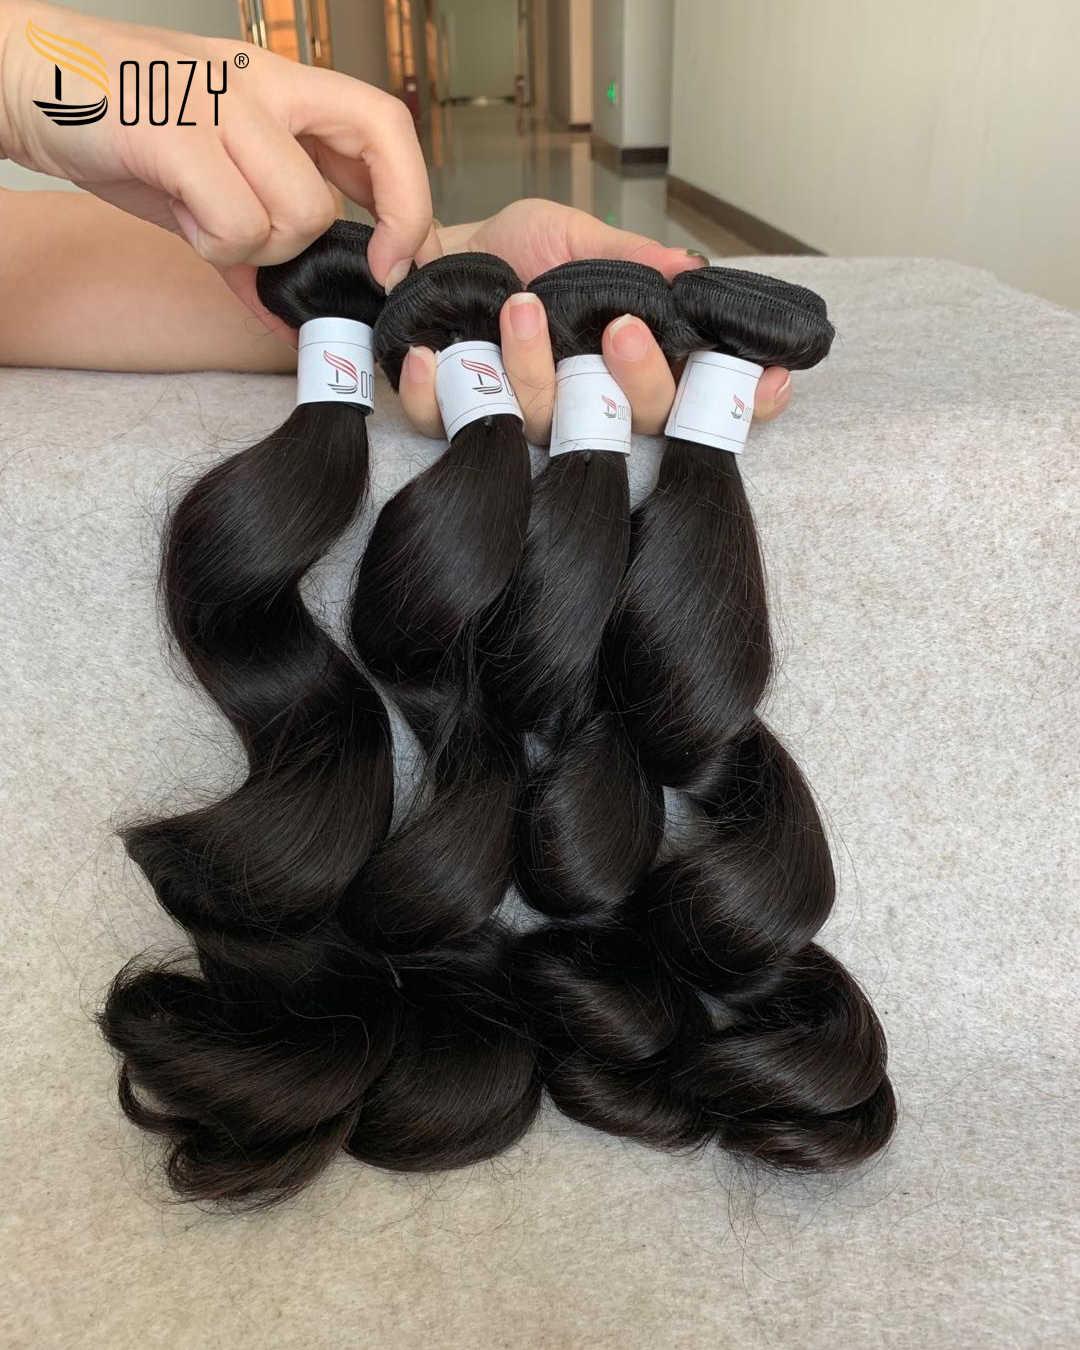 Pelo Doozy onda suelta 10A pelo virgen peruano 4 paquetes de cabello humano virgen